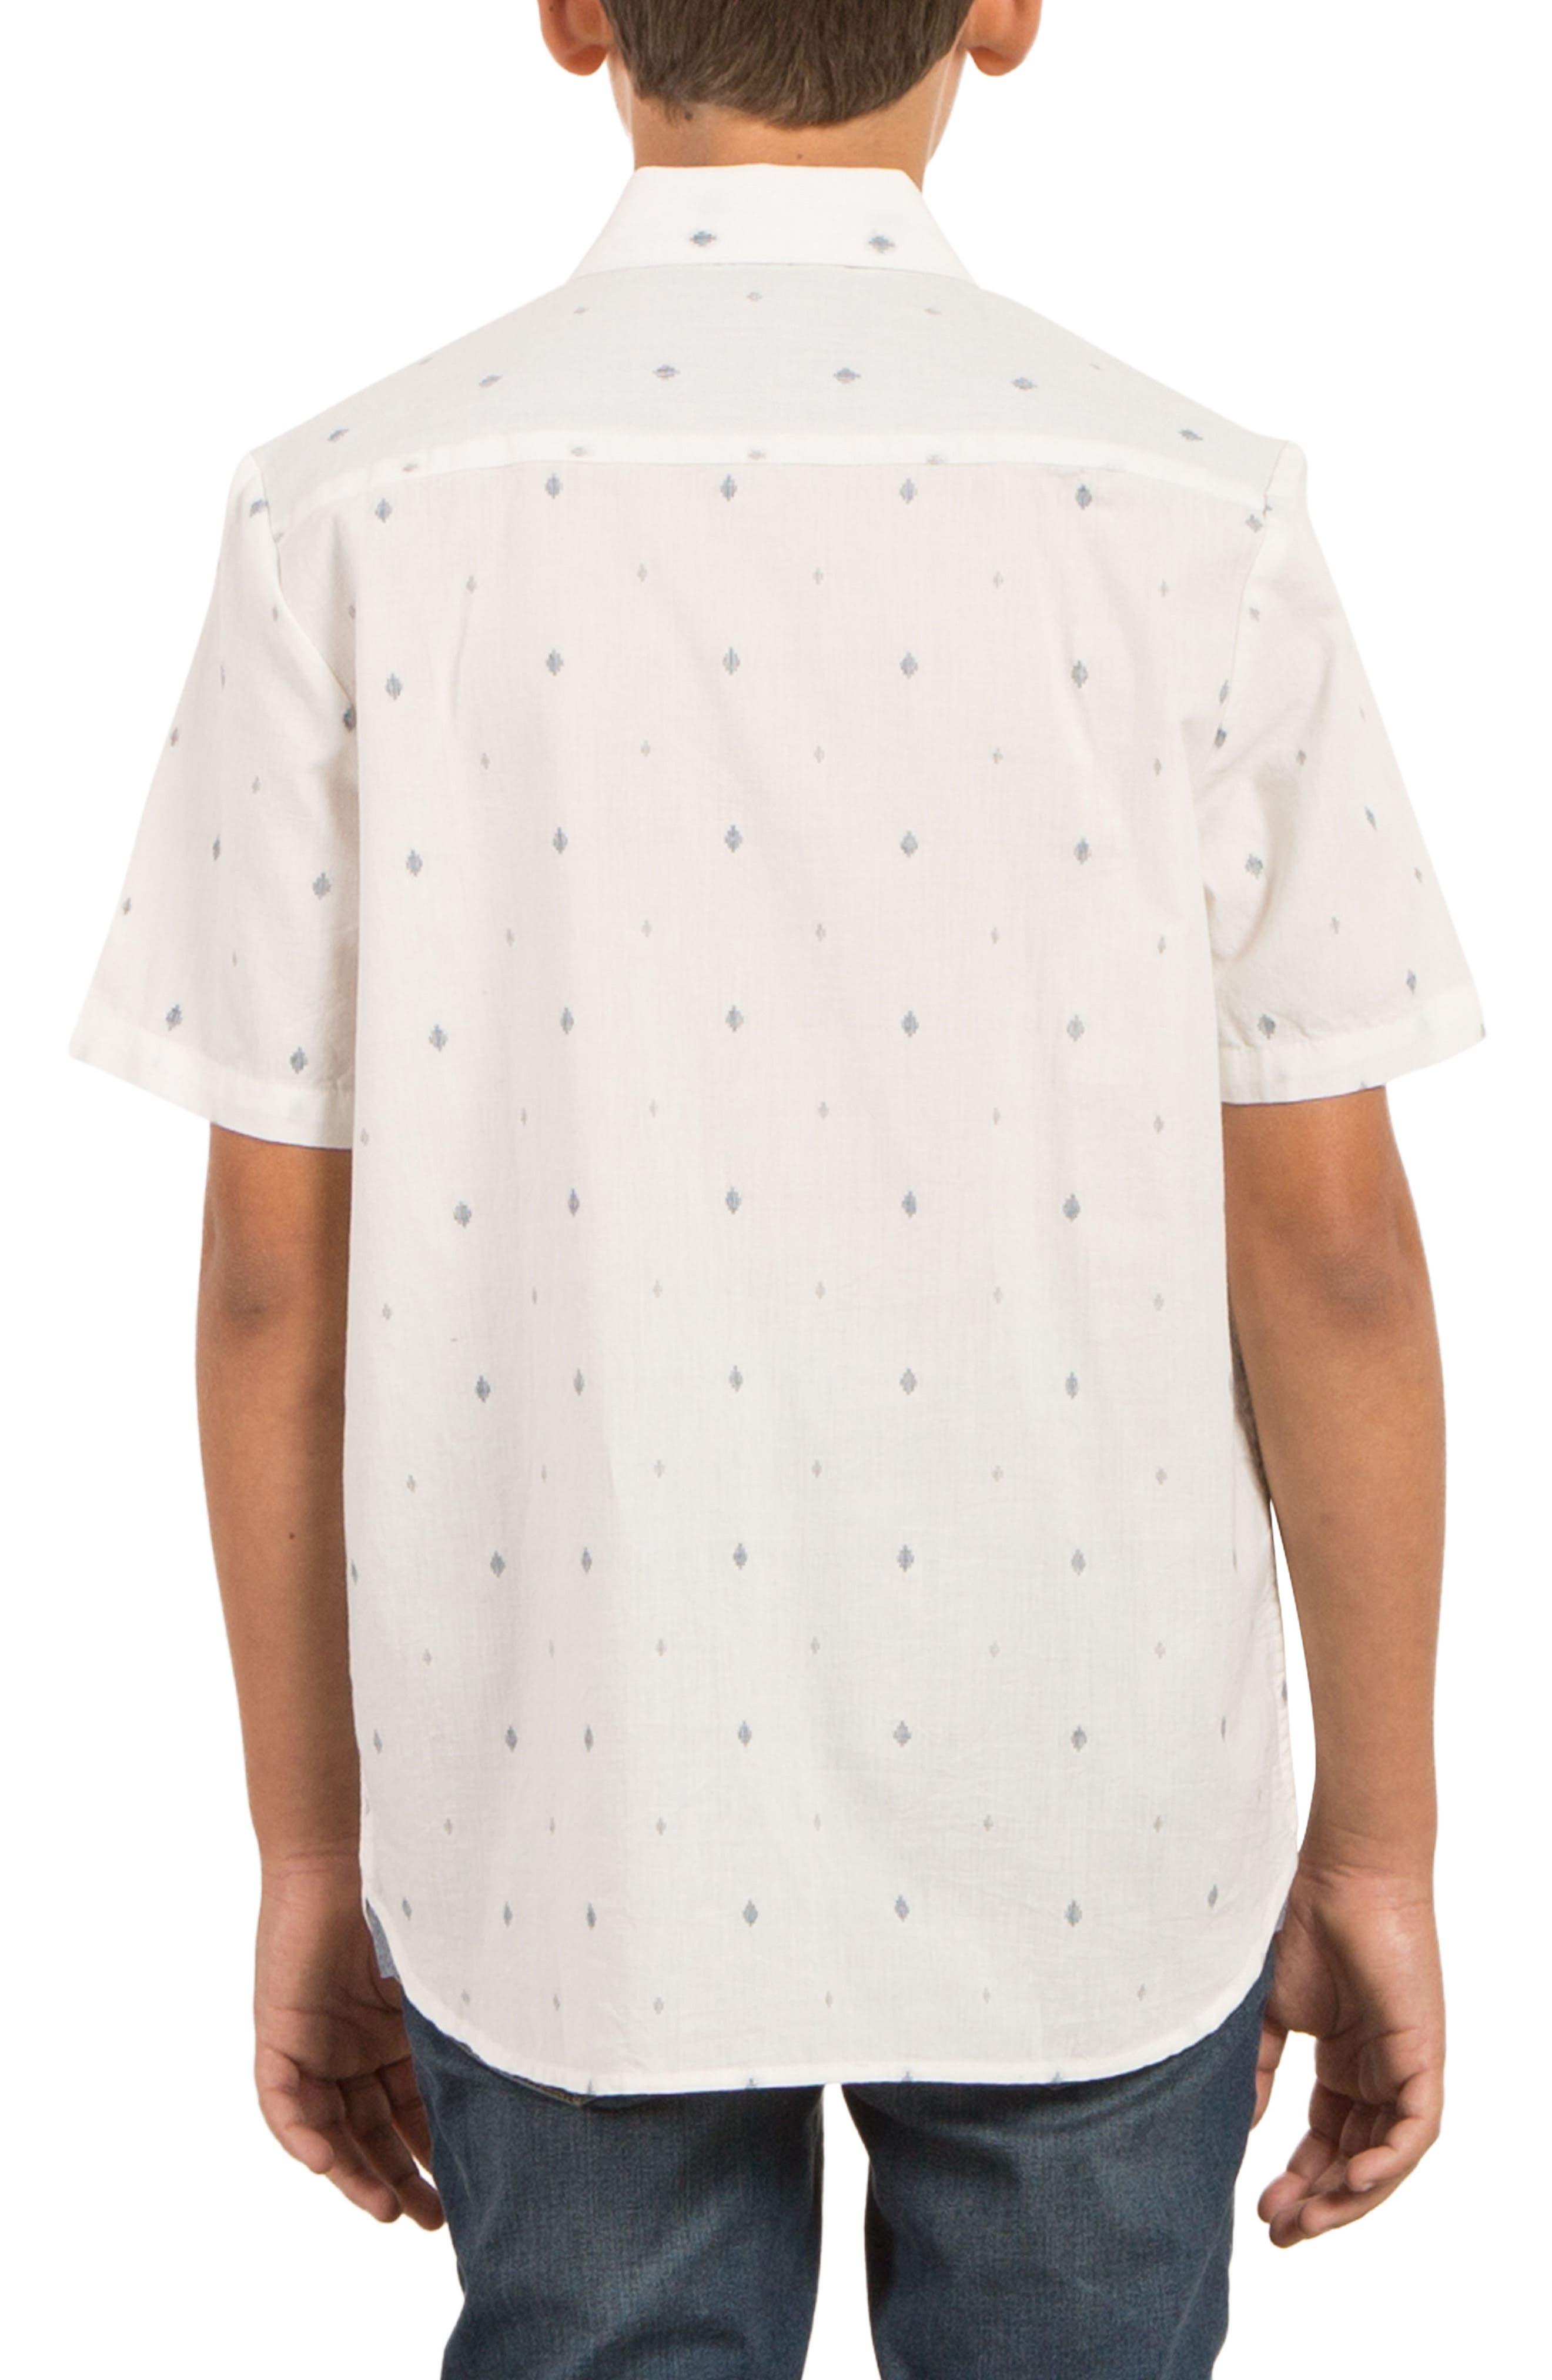 Interlude Print Woven Shirt,                             Alternate thumbnail 2, color,                             Cloud